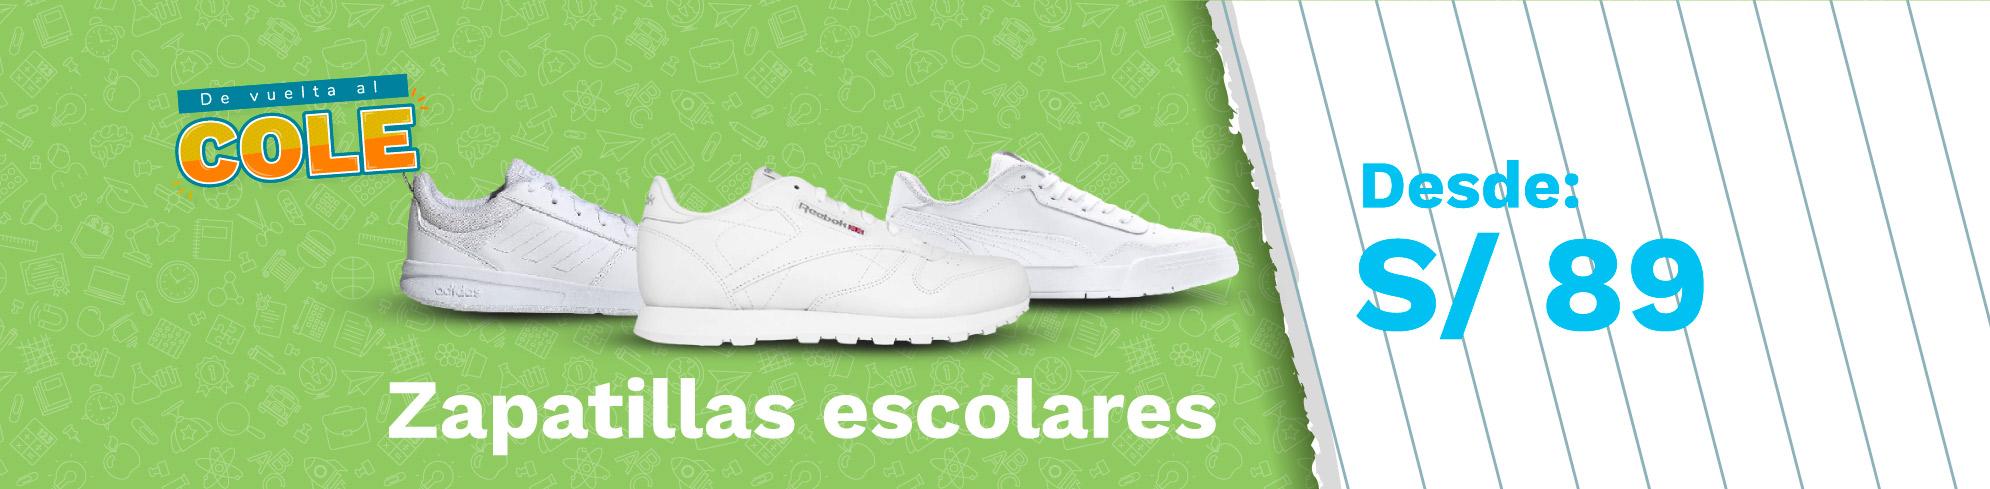 Banner Zapatillas Escolares